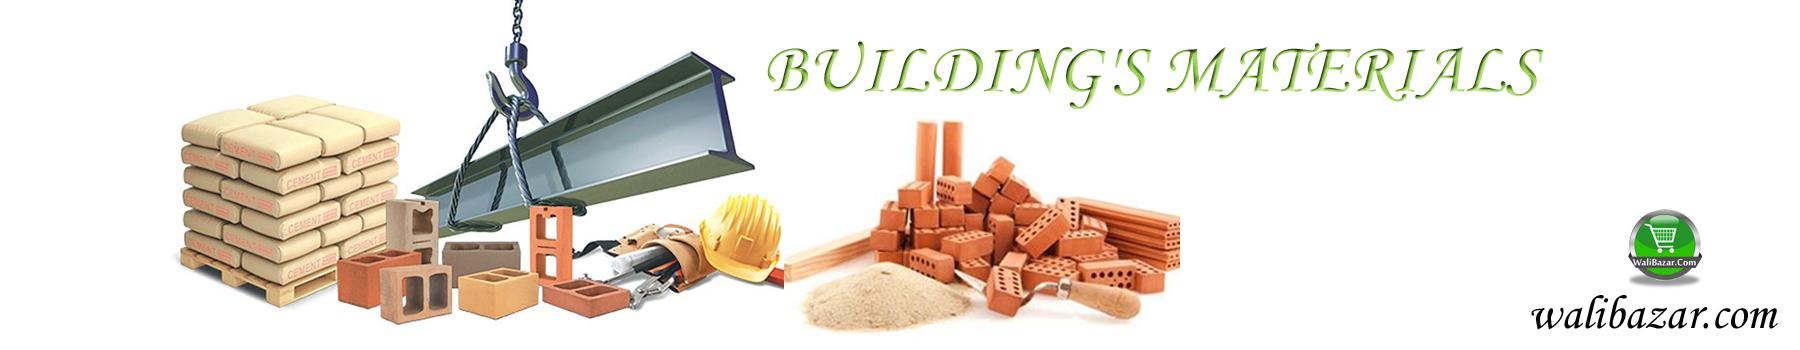 BUILDING'S MATERIALS